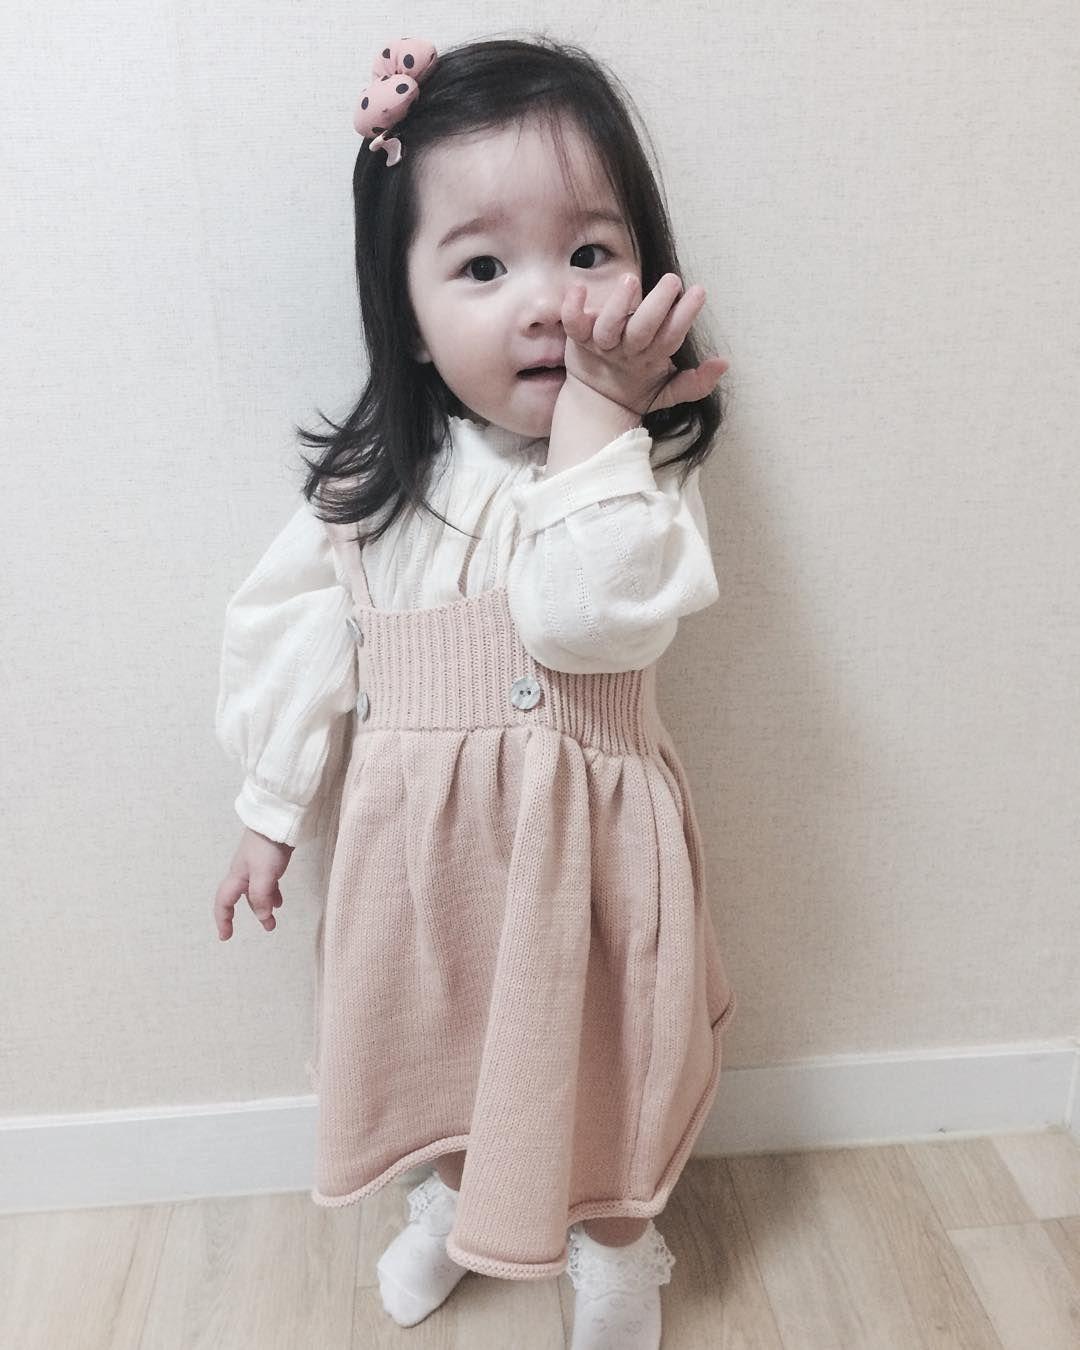 2019 year for women- Girl baby fashion tumblr photo